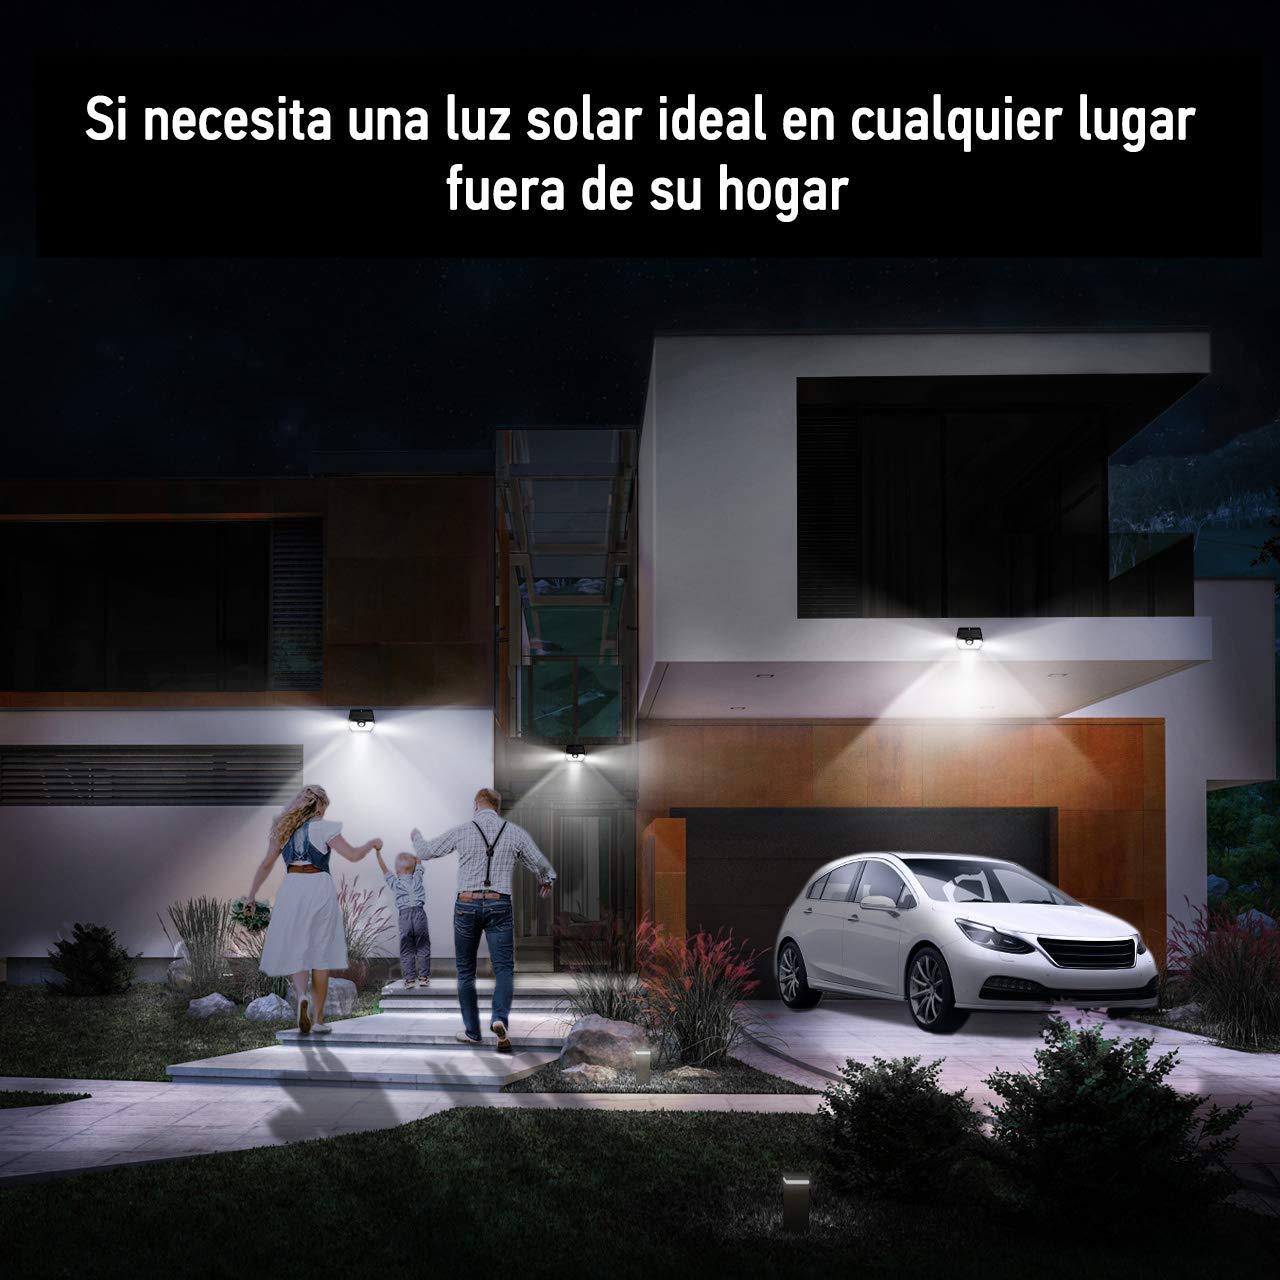 Mpow Luz Solar de Exterior Garaje Patio L/ámpara Solar 20 LED 1 Pieza 270/º Gran Angular de Iluminaci/ón con 120/° Sensor de Movimiento Impermeable Foco Solar de Pared para Jard/ín Camino